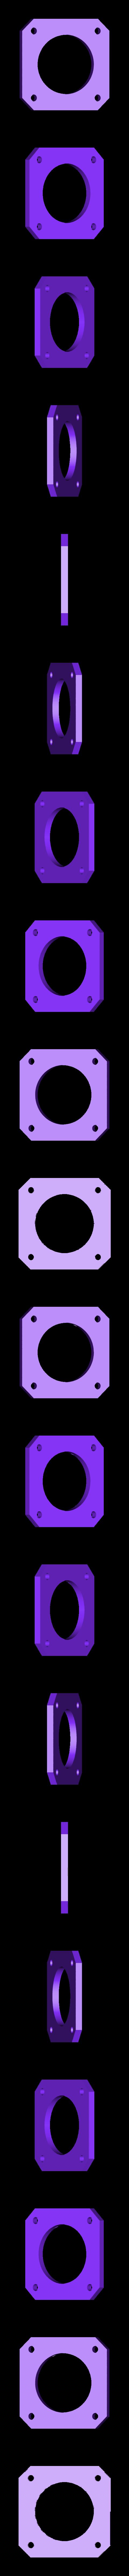 nema17.stl Download free STL file Silent Mod for EVERY 3d Printer !MUST HAVE! (nema damper) • 3D print template, OneIdMONstr